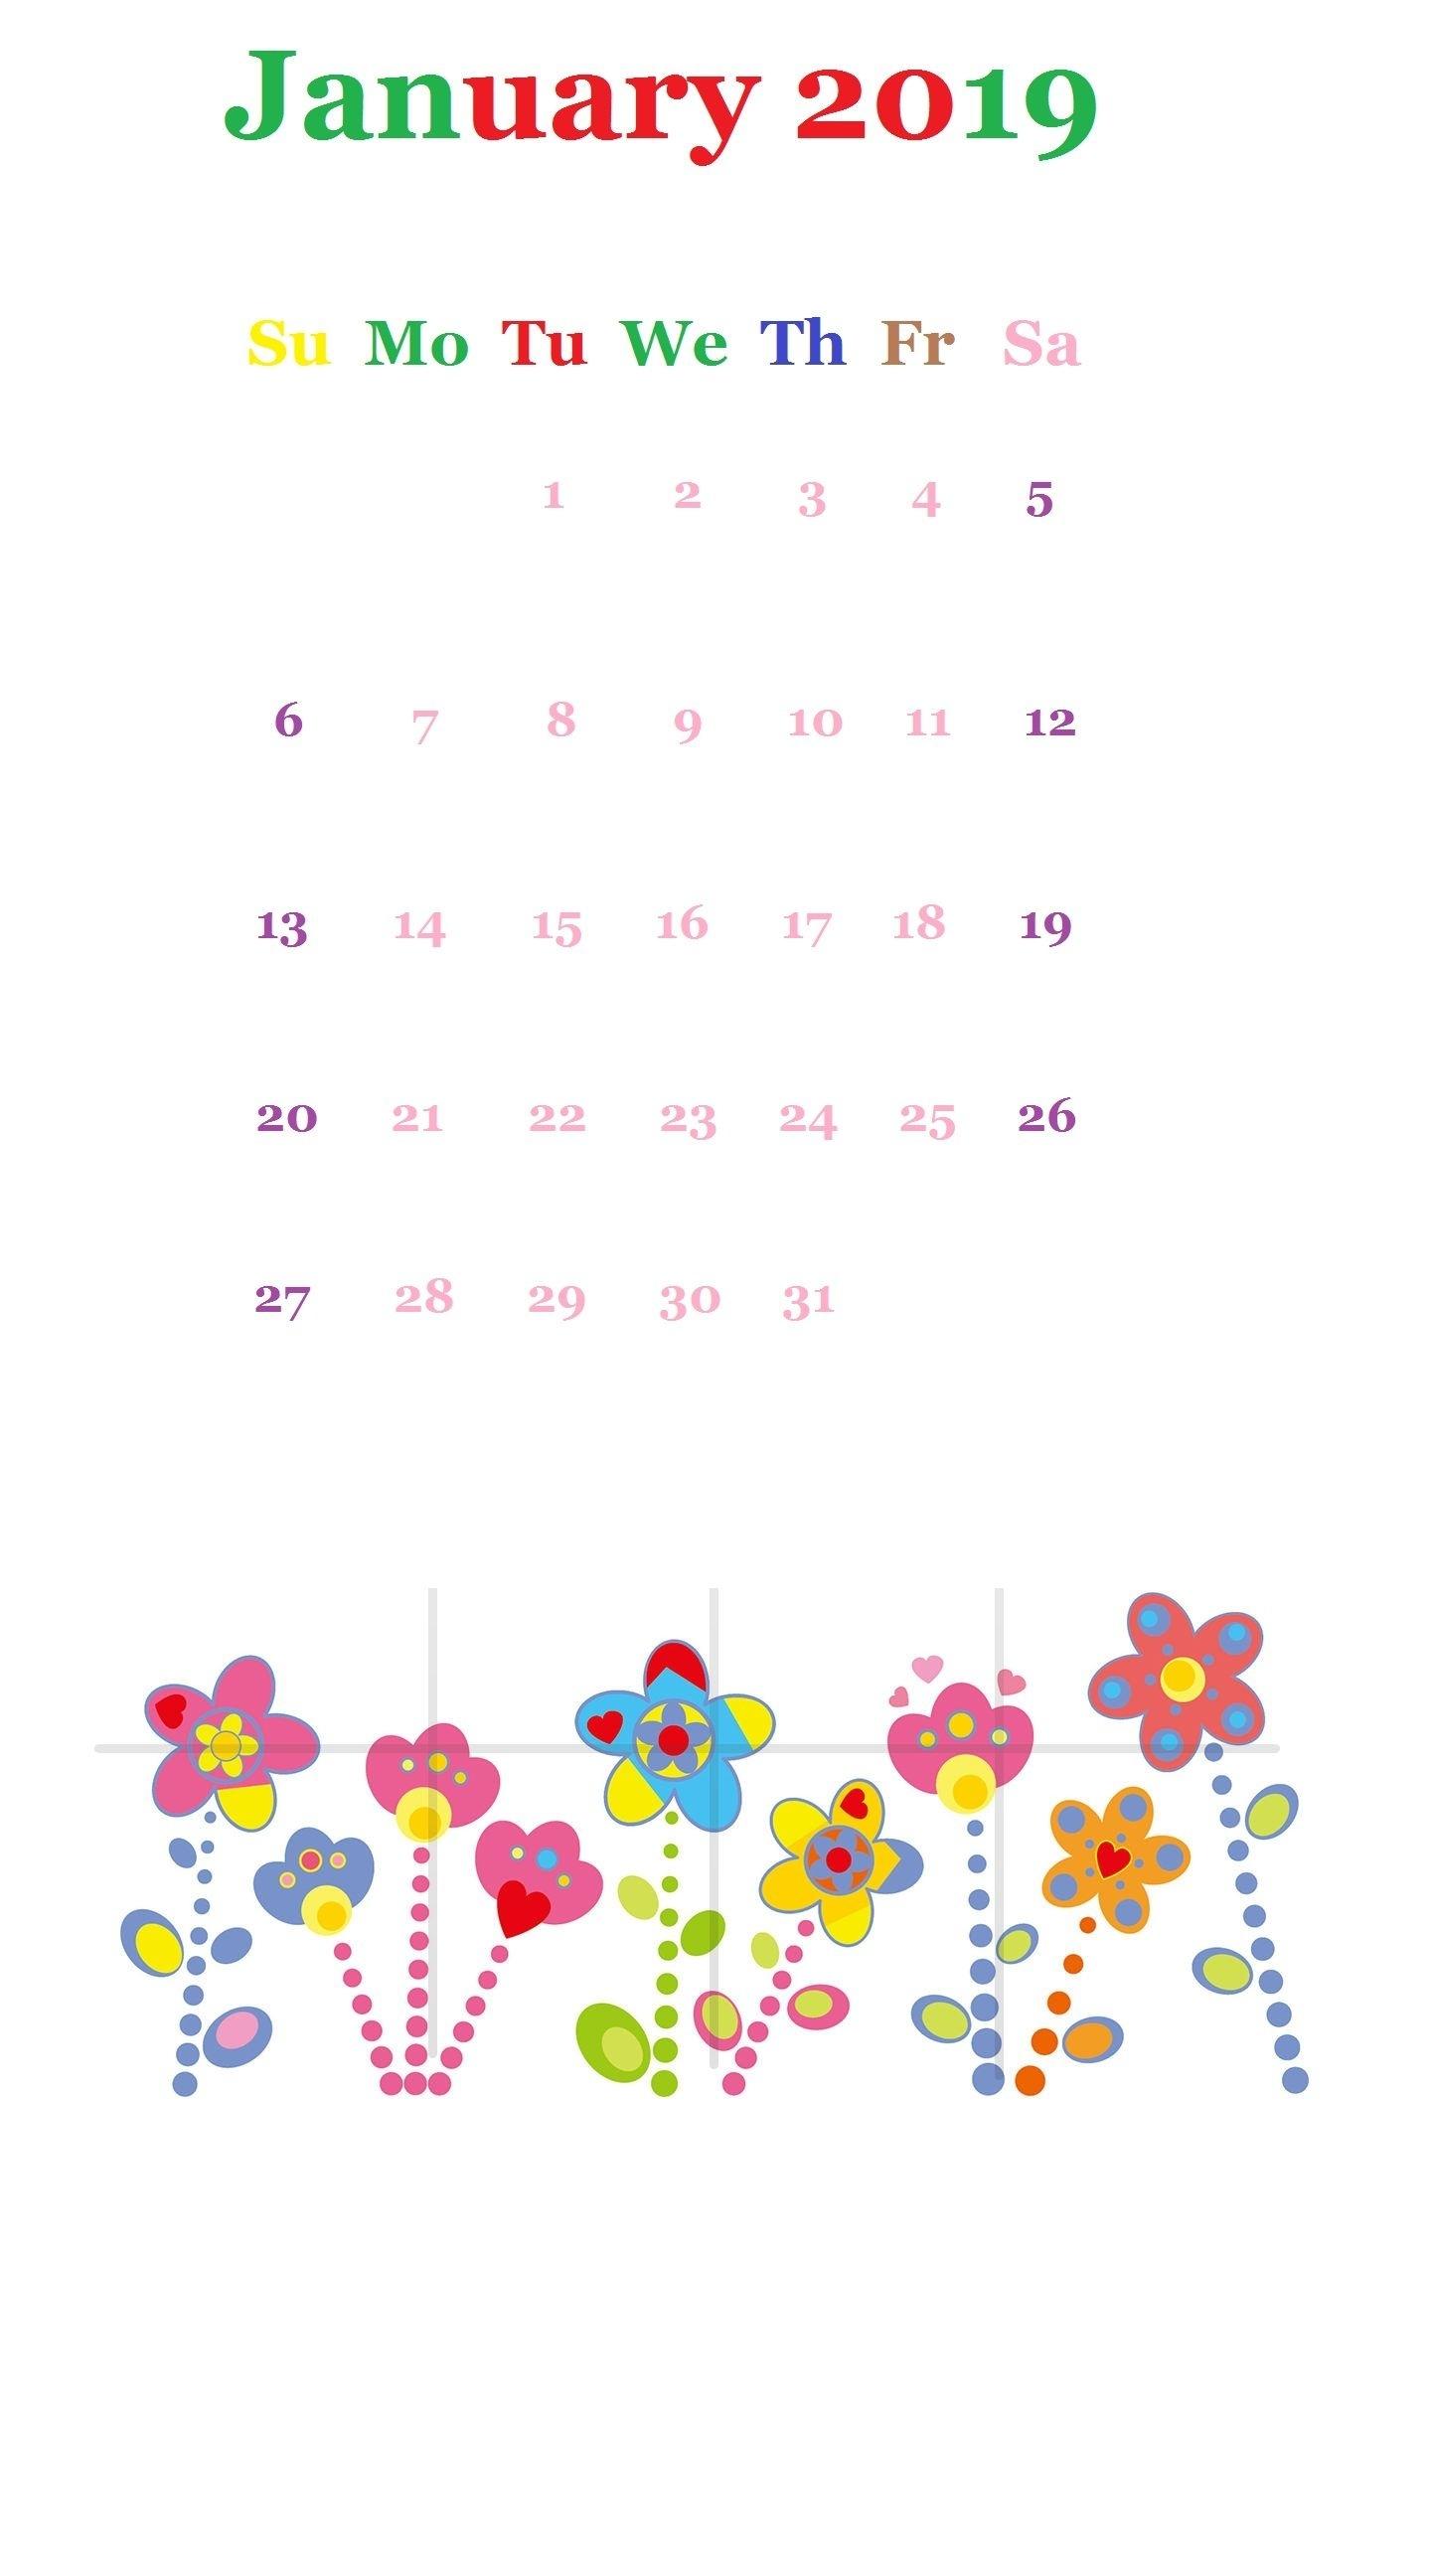 Tumbler January 2019 Iphone Calendar | Calendar Designs In 2019 inside Calendars For January Background Designs